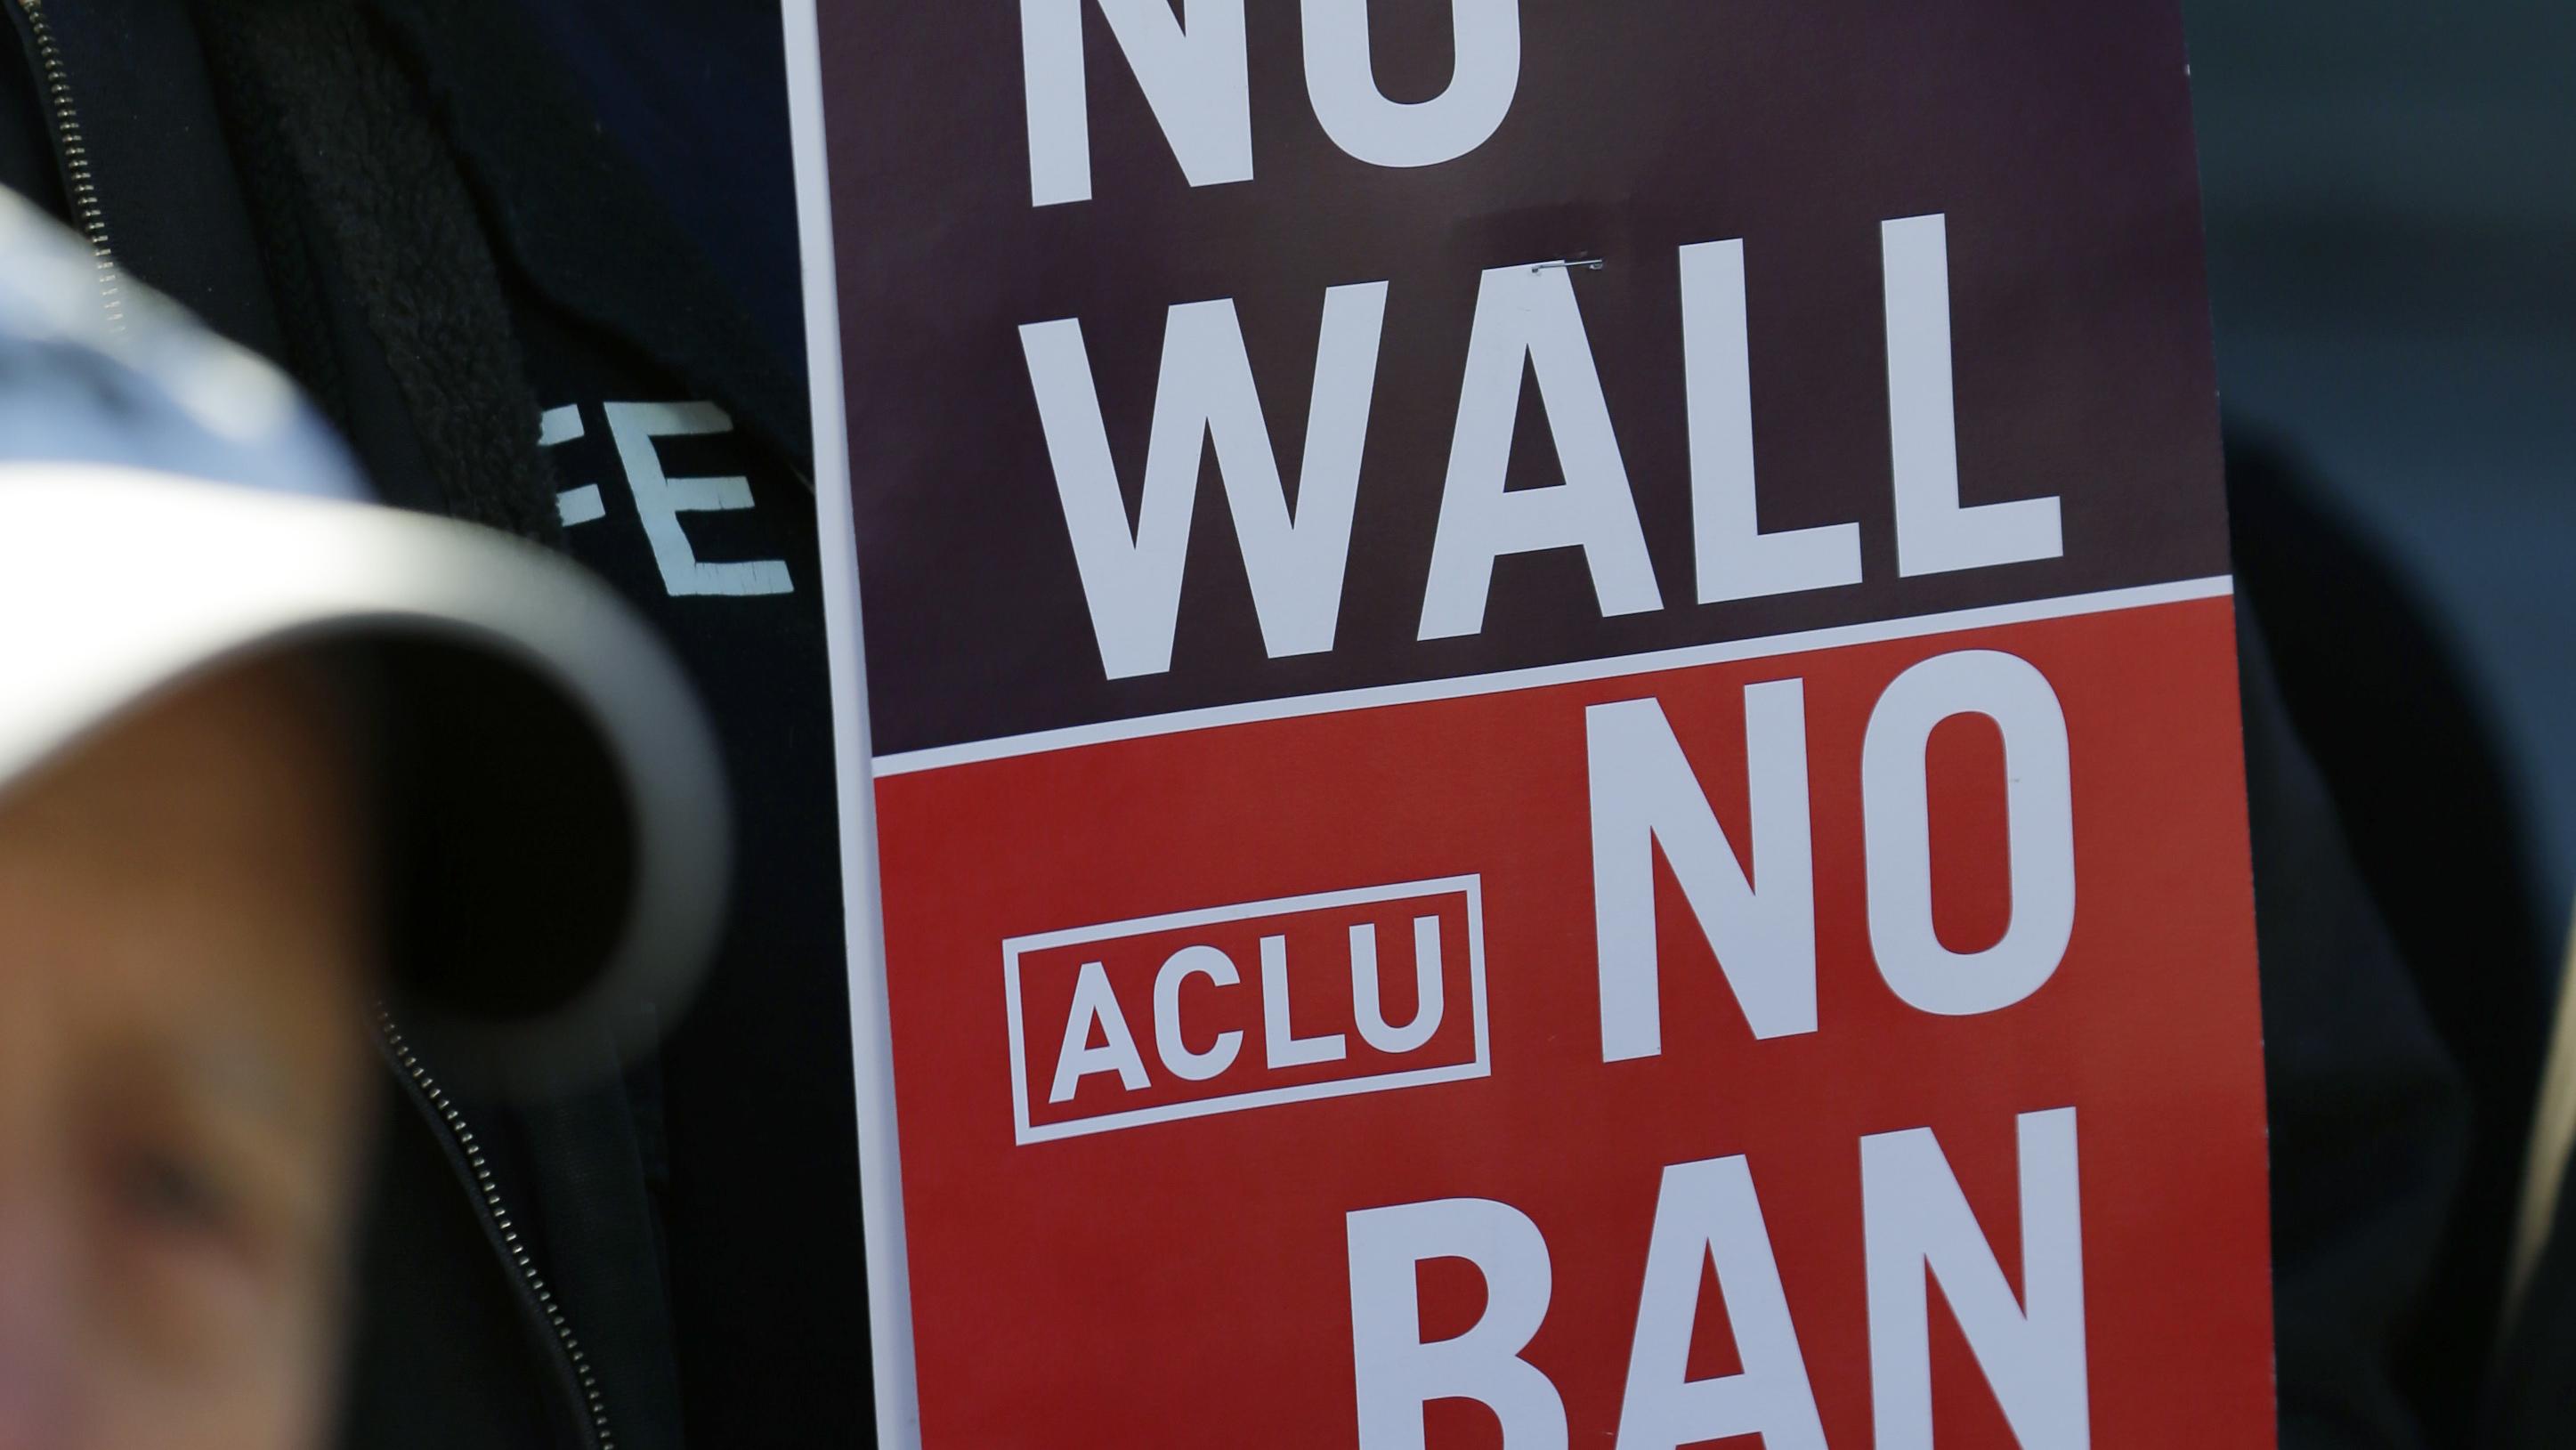 Netflix, Viacom, SAG-AFTRA Urge Legislators to Halt North Carolina Anti-LGBT Bills